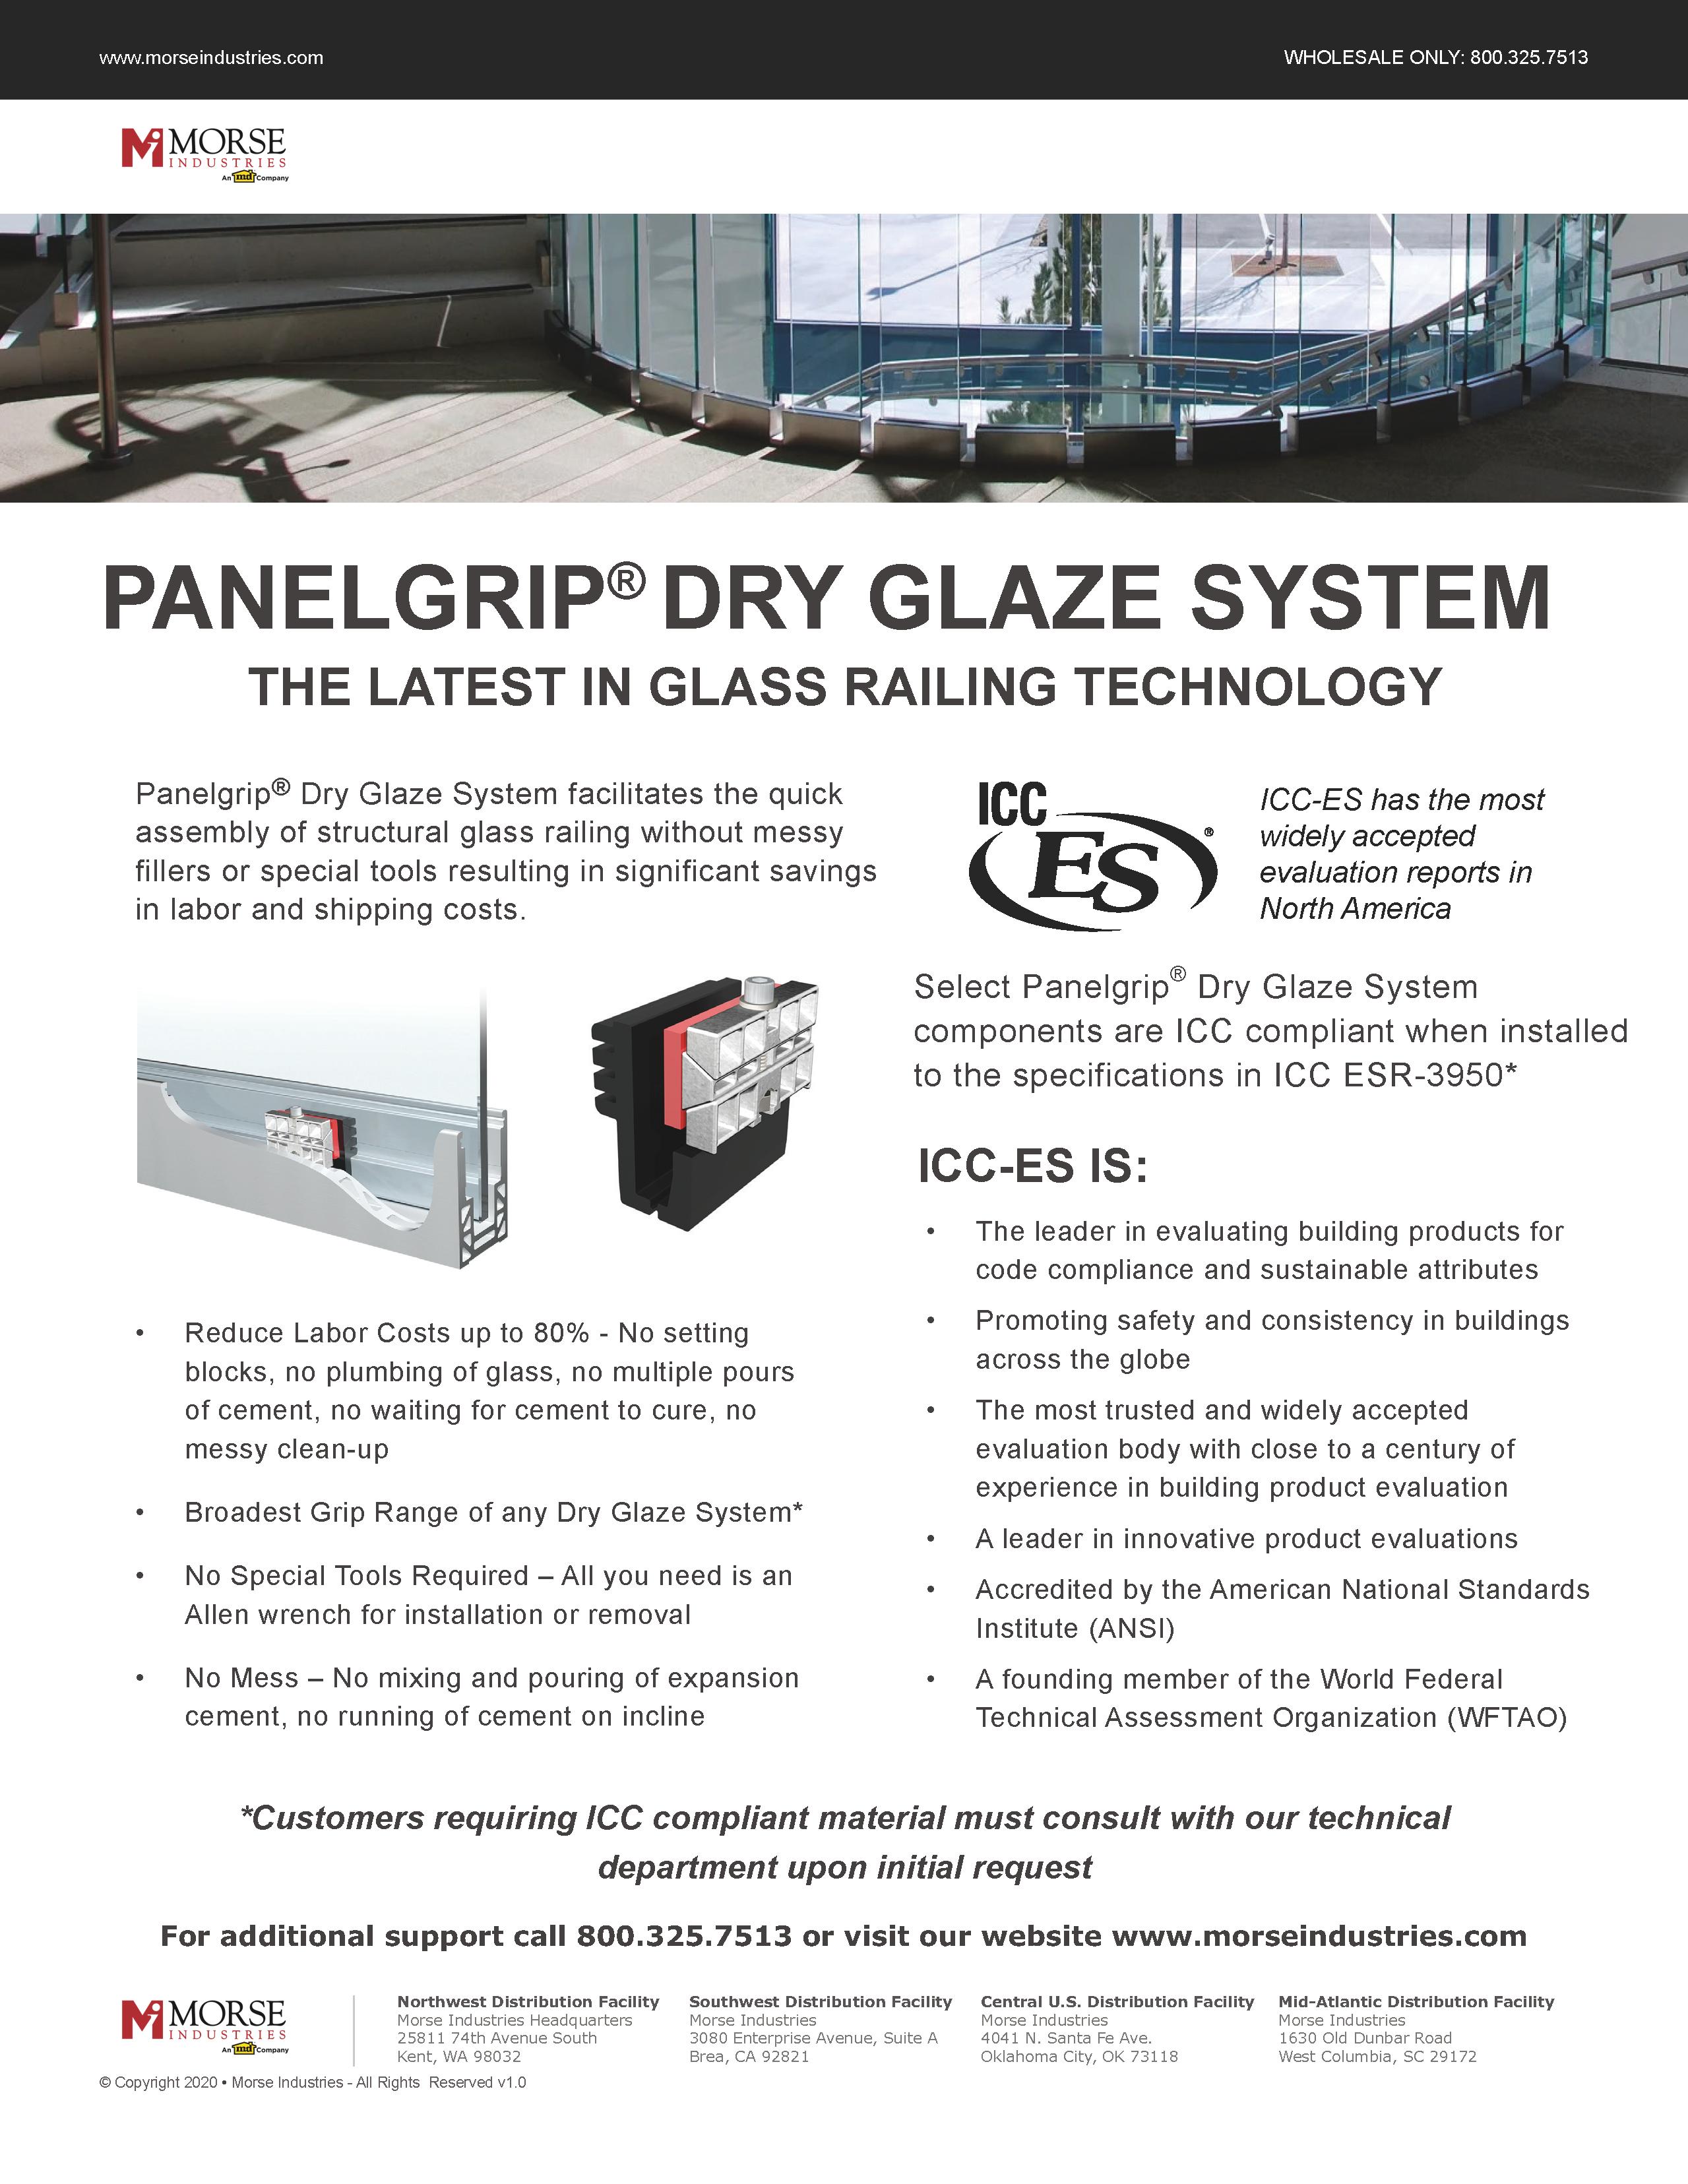 Panelgrip® Dry Glaze System